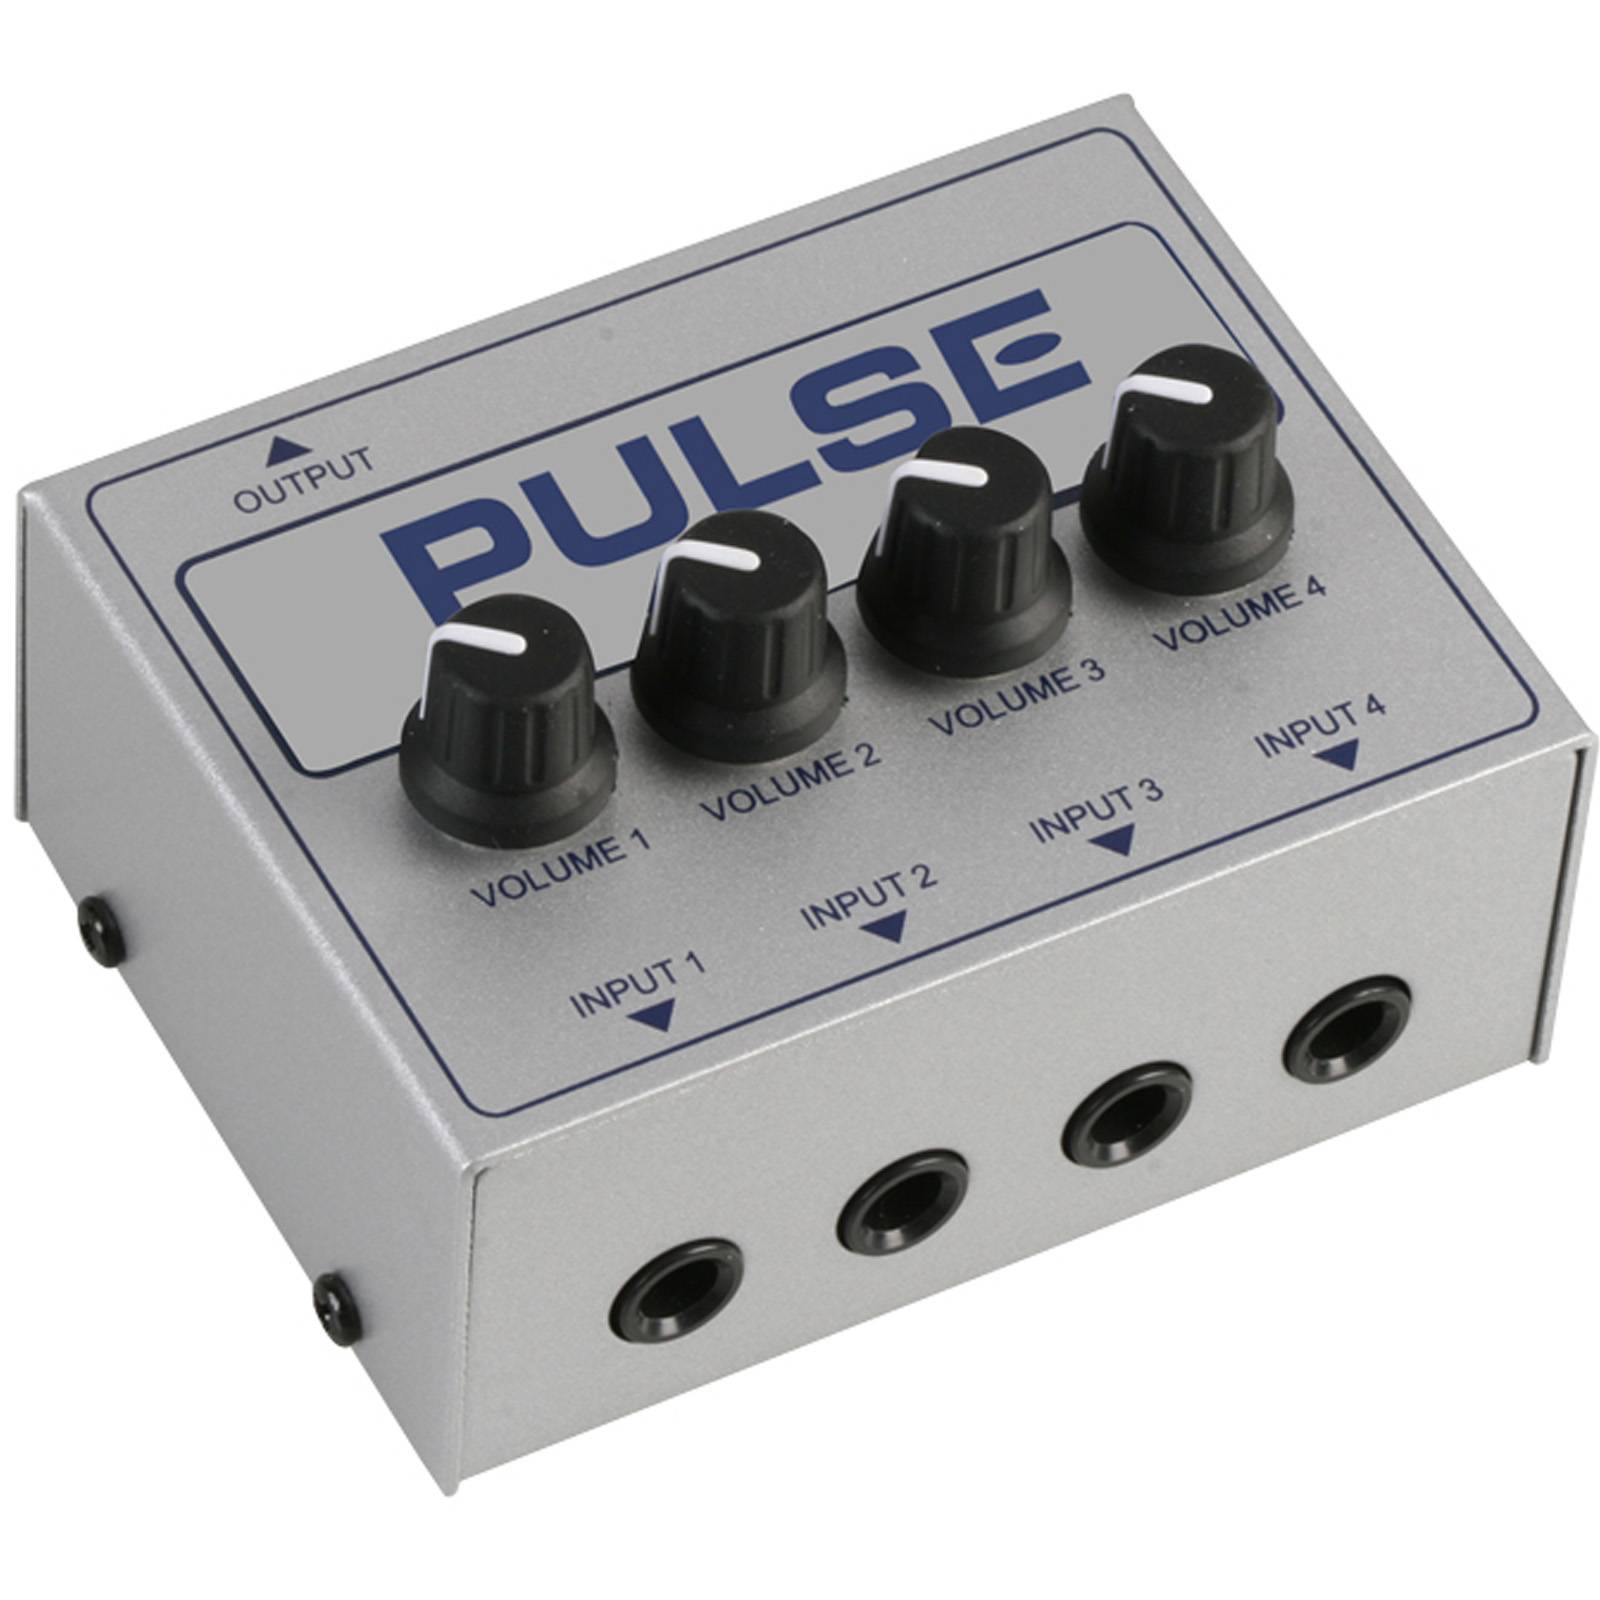 pulse 4ch passive line mini mixer mixers from inta audio uk. Black Bedroom Furniture Sets. Home Design Ideas